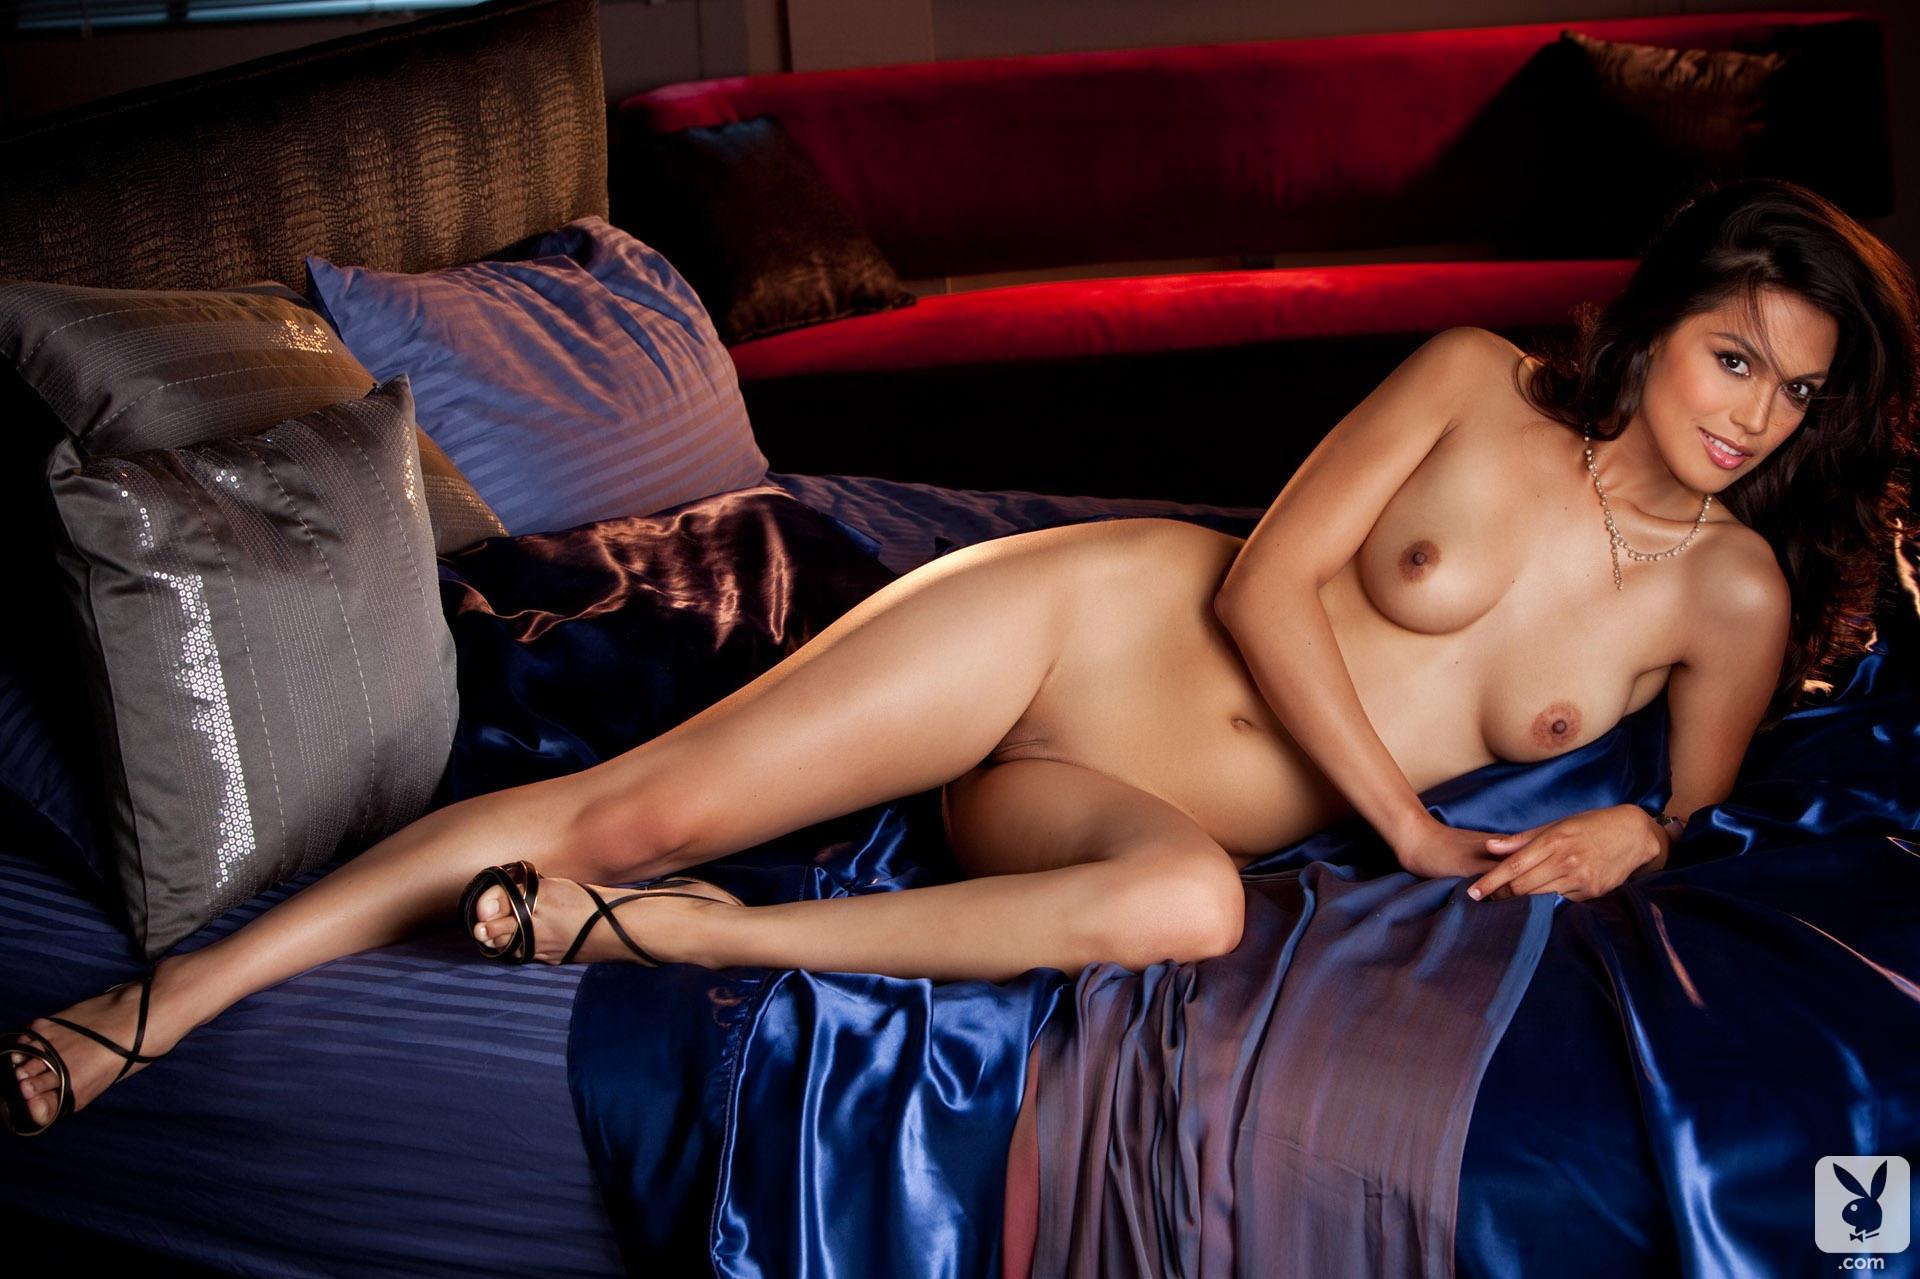 Cute playboy girls nude